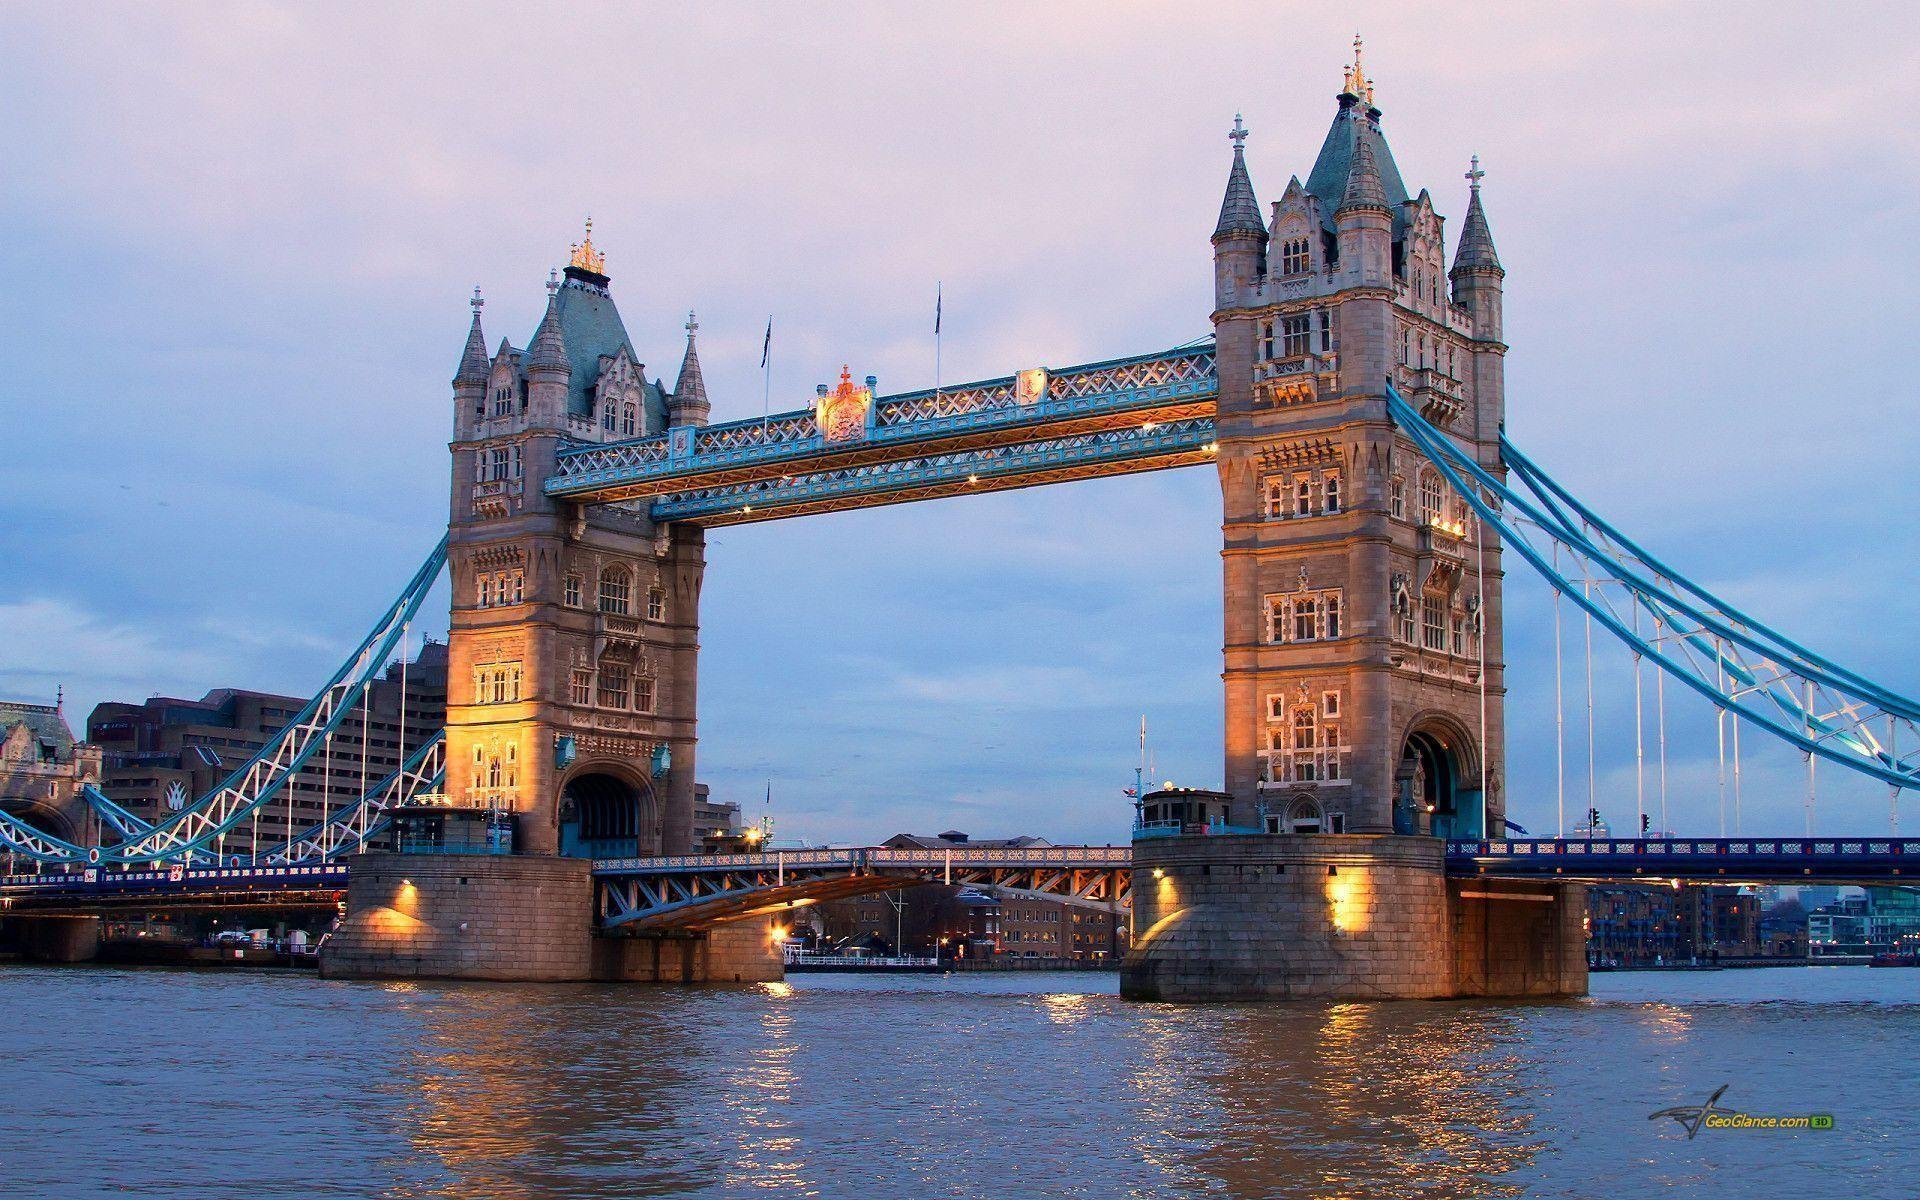 Beautiful Wallpaper Macbook London - 963731-best-london-bridge-wallpaper-1920x1200-macbook  Image_18912.jpg